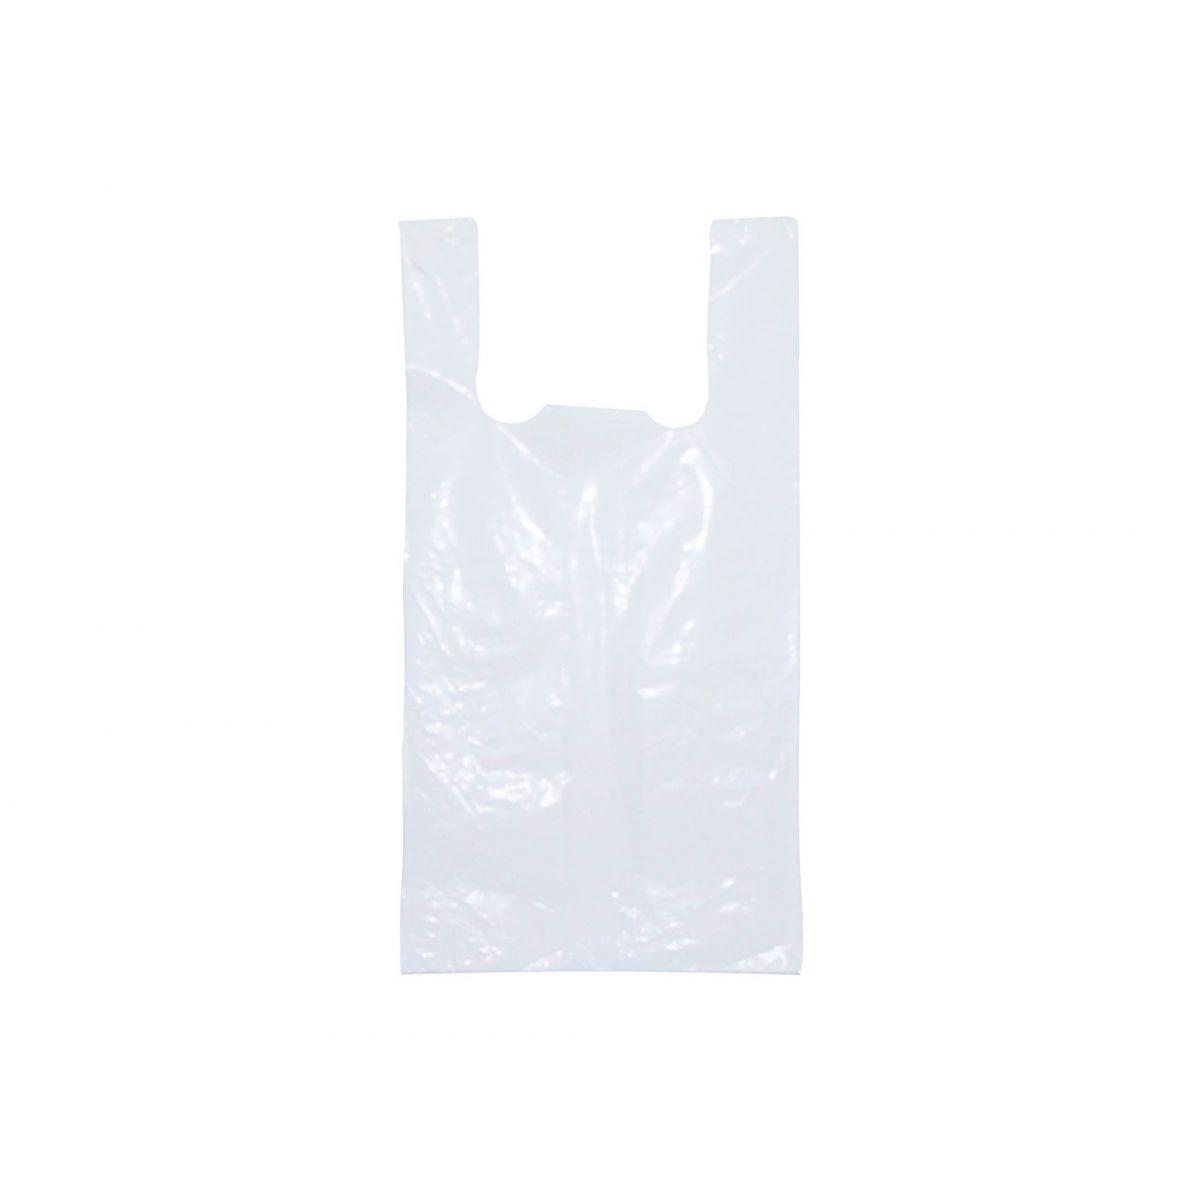 Sacola plástica Branca (espessura fina) - 25x35cm - Pacote 1000 unid